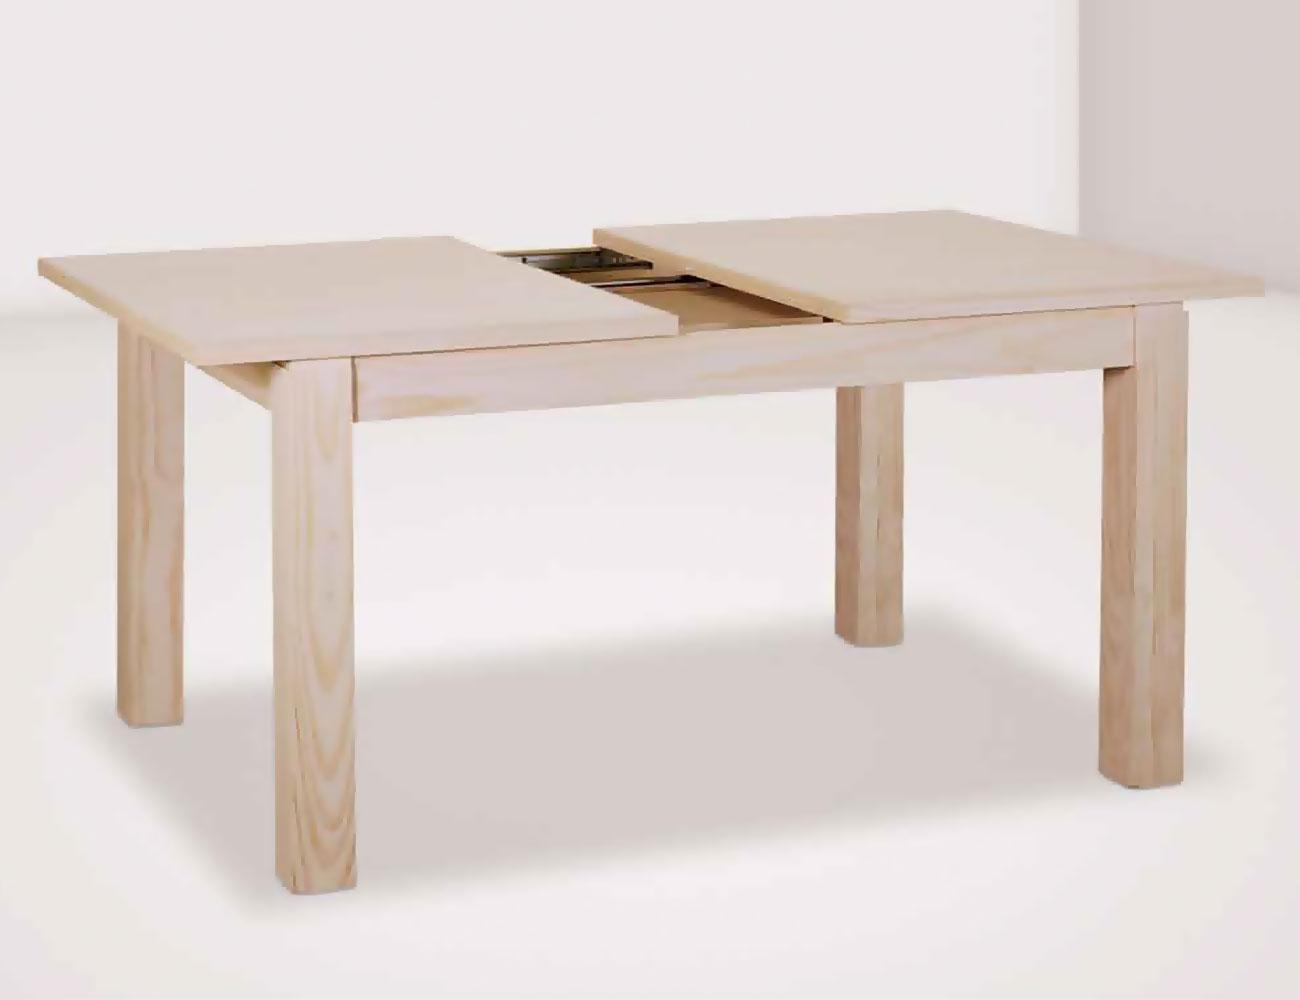 mesa comedor extraible tapa 26 140 cm en madera con patas